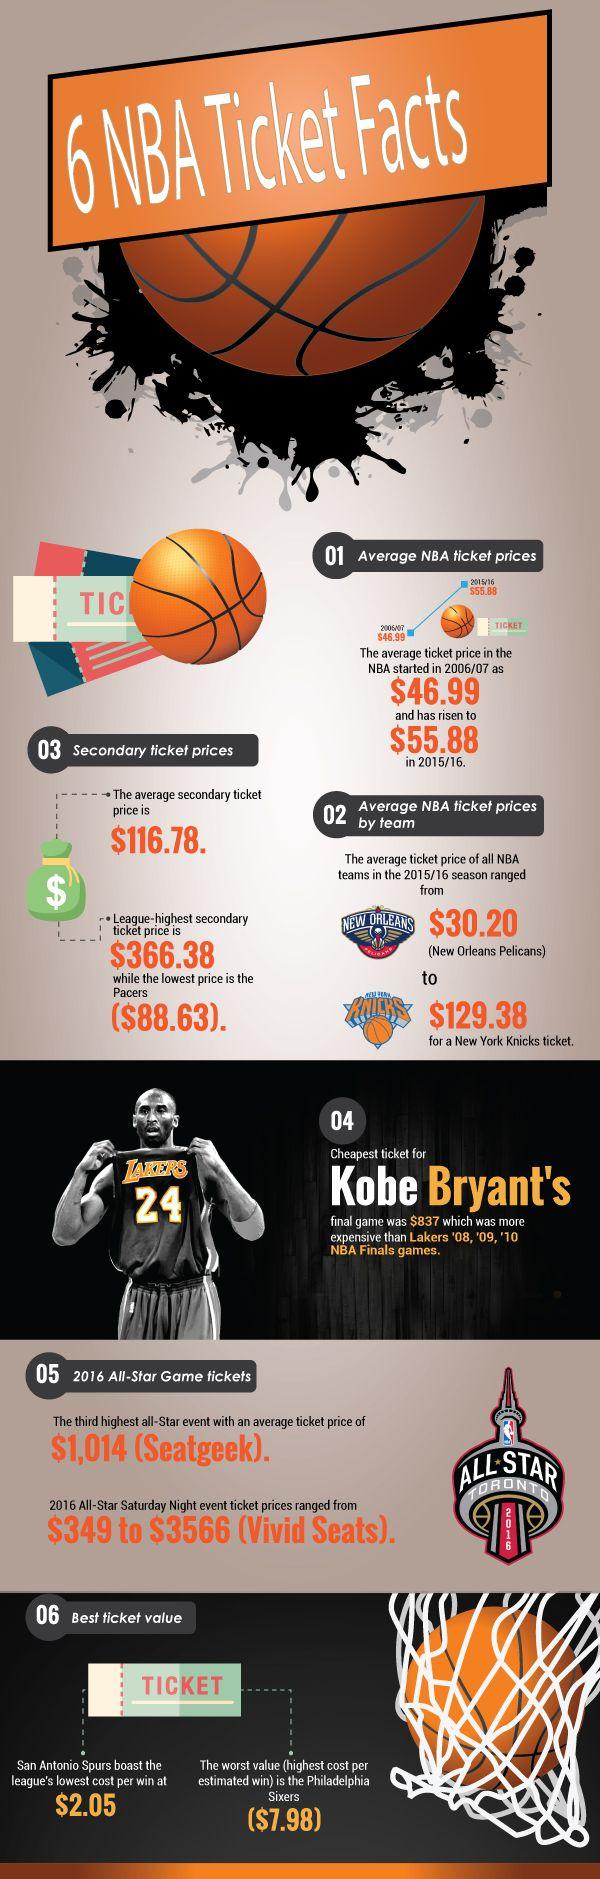 NBA Ticket Facts (2015/16 season) #Infographic #NBA